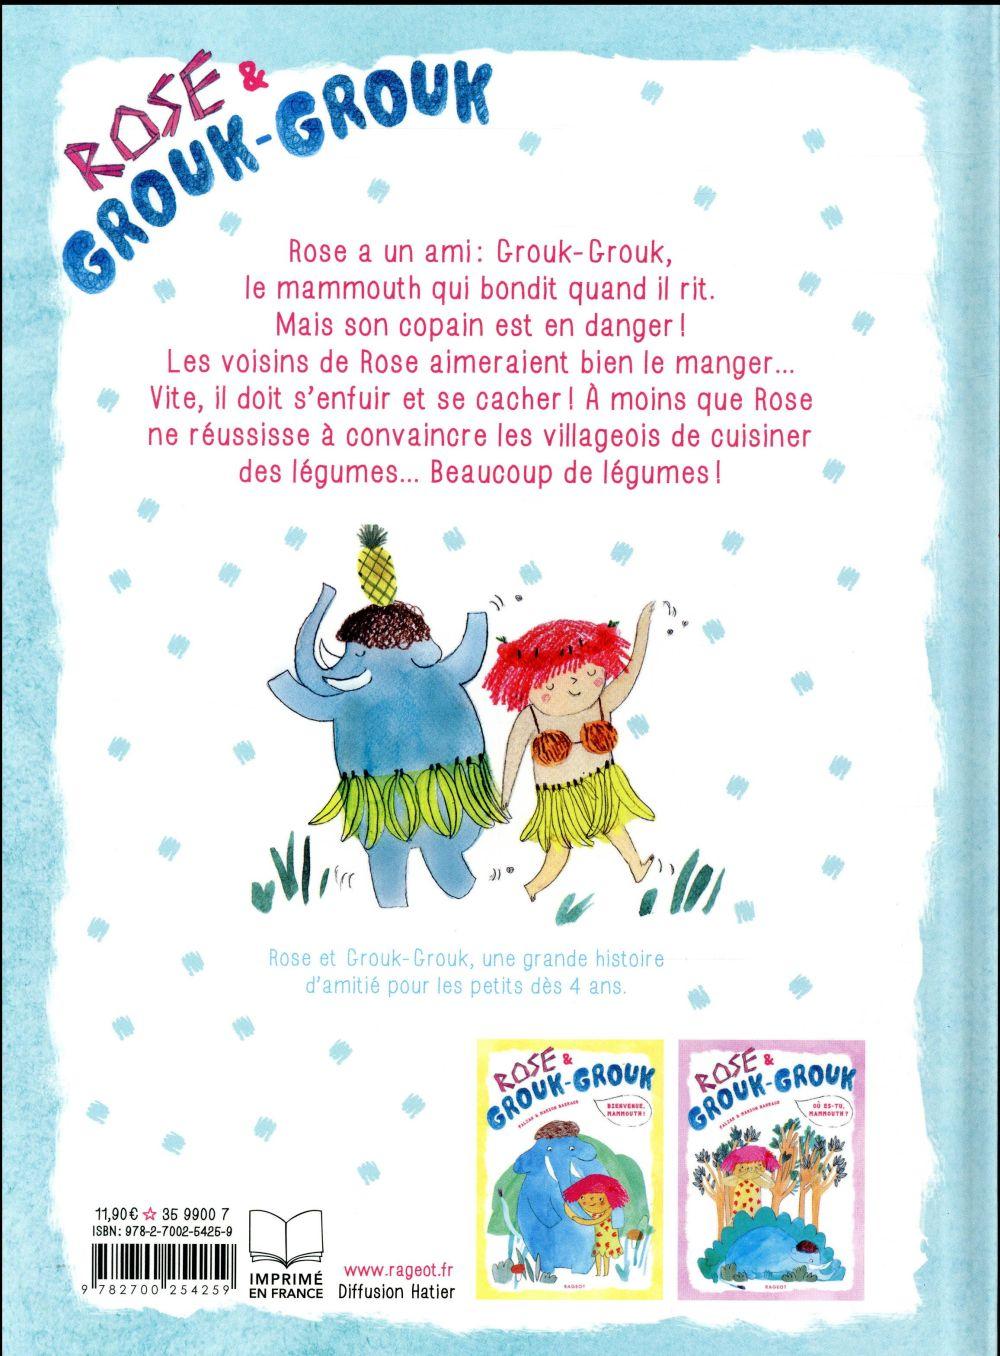 Rose & Grouk-Grouk ; à table, mammouth !